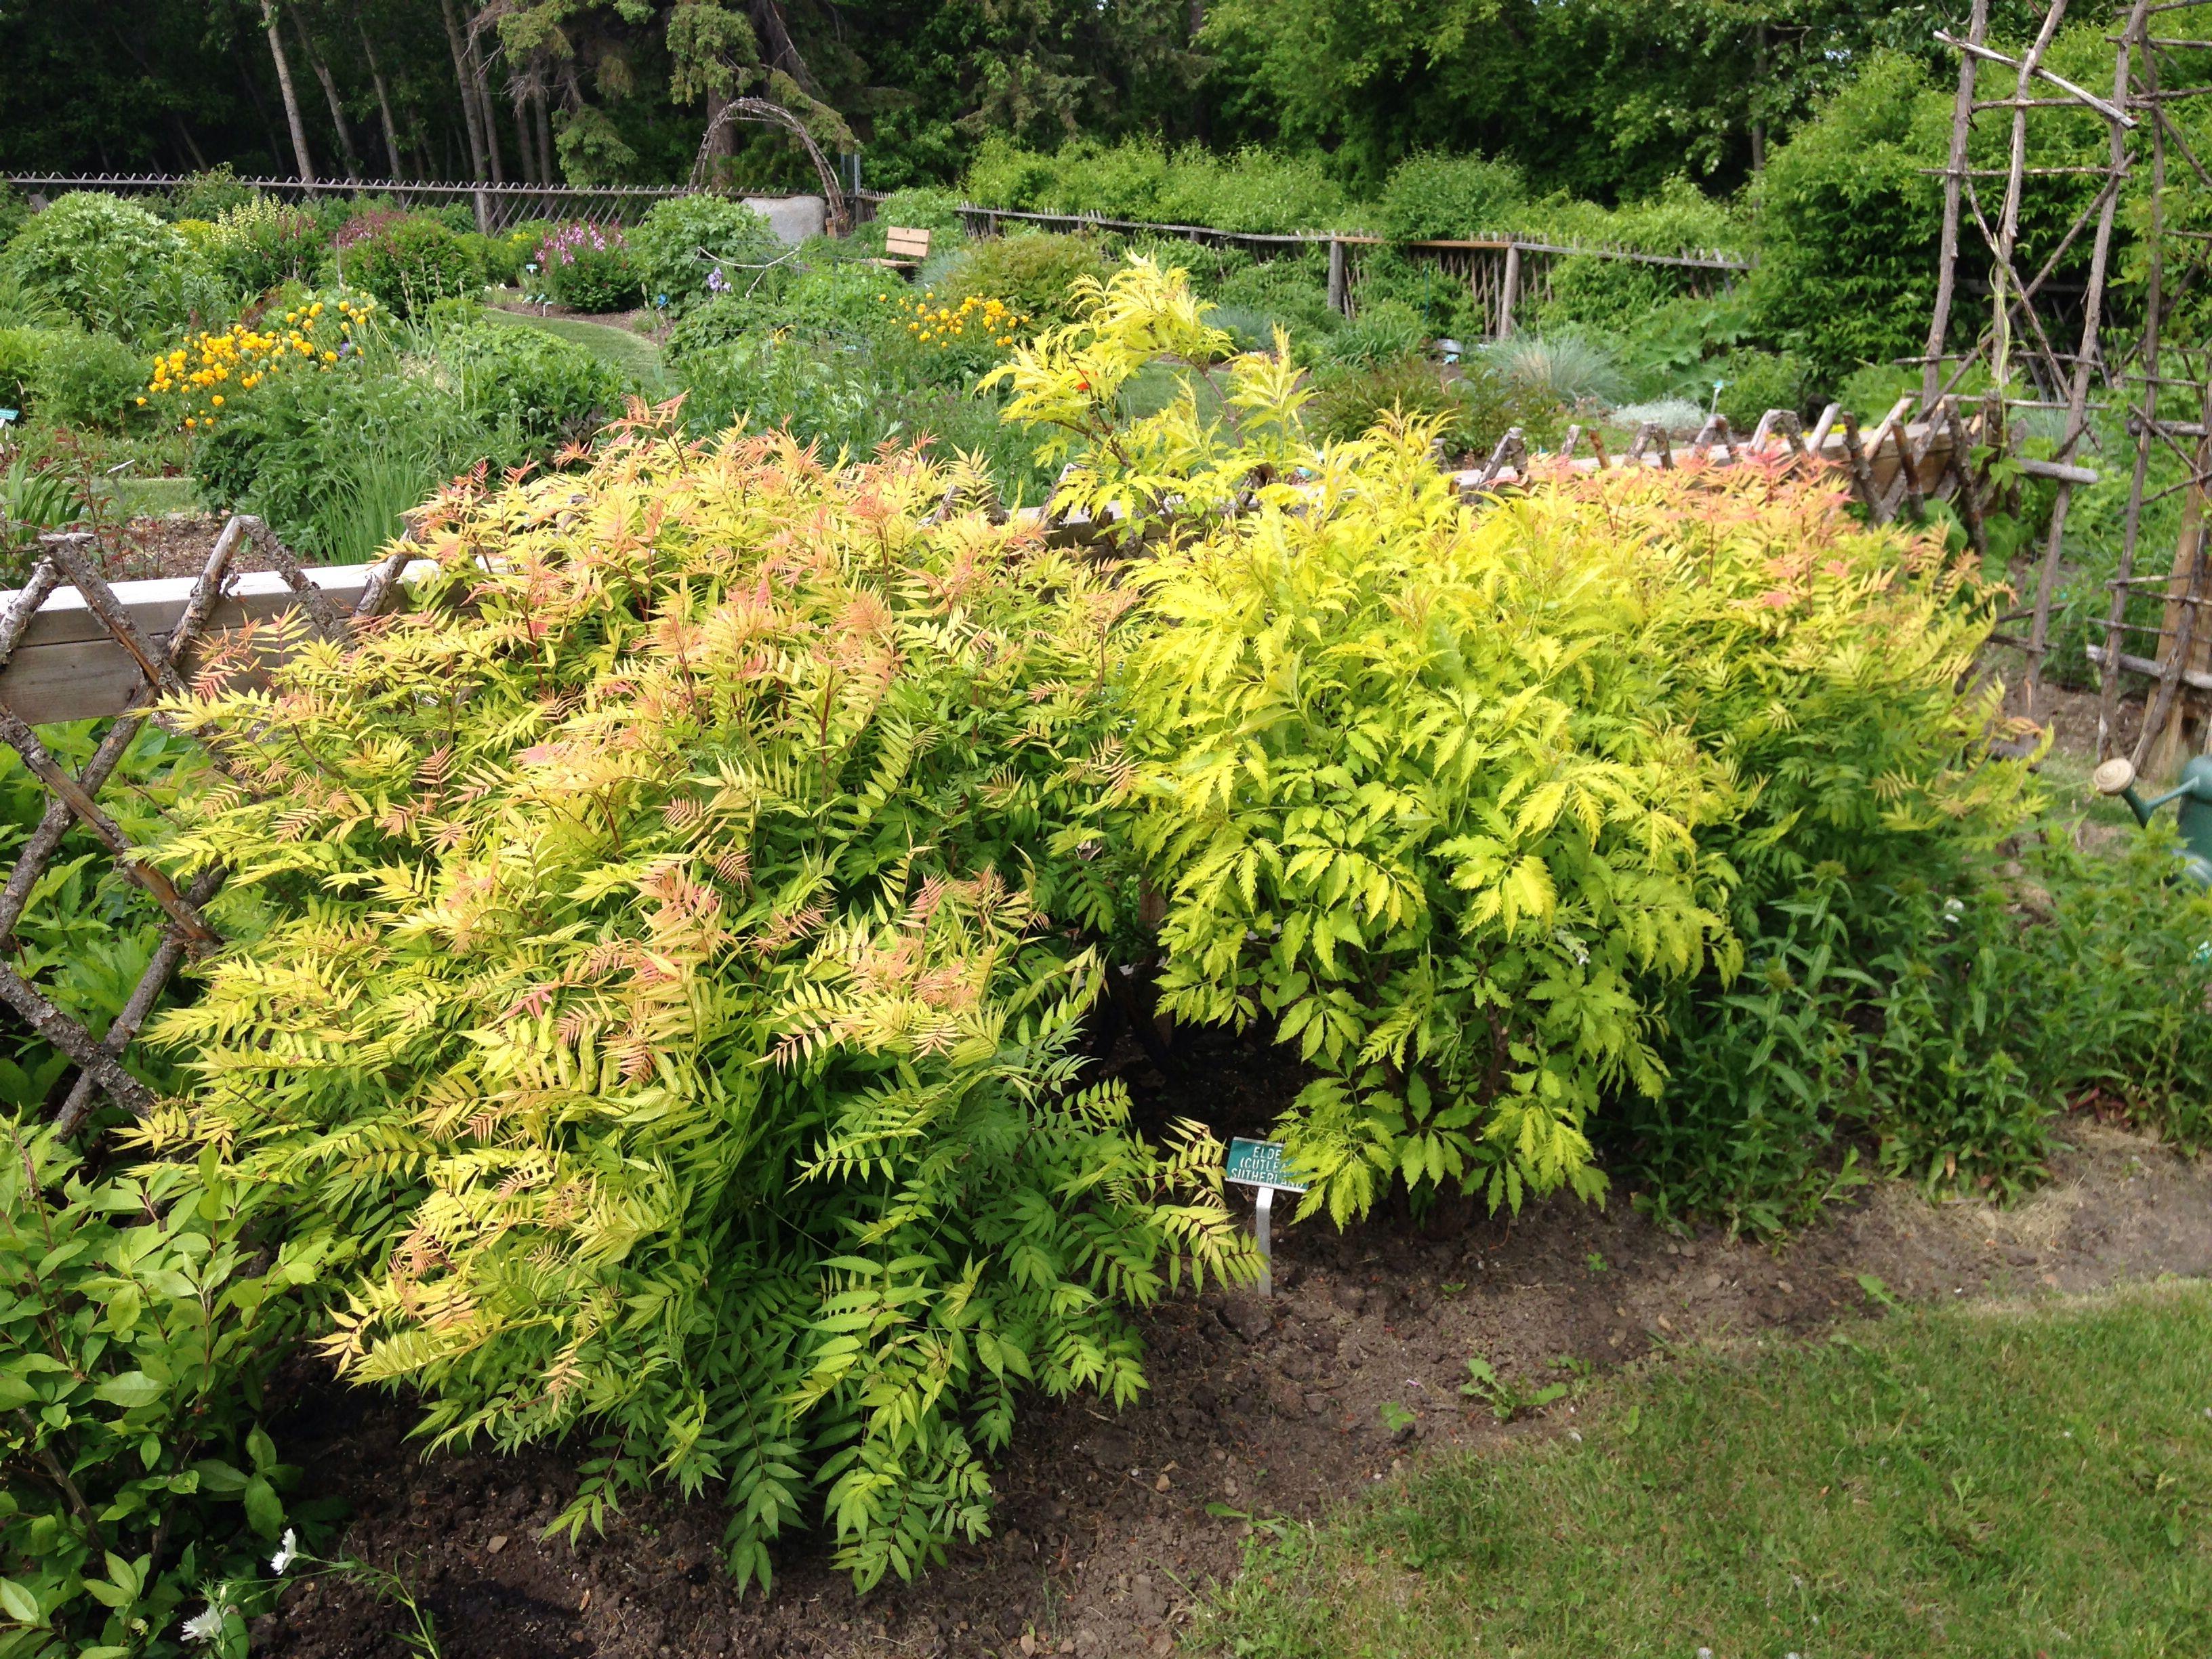 False Spirea Sem Landscaping Shrubs Landscape Projects Cool Plants